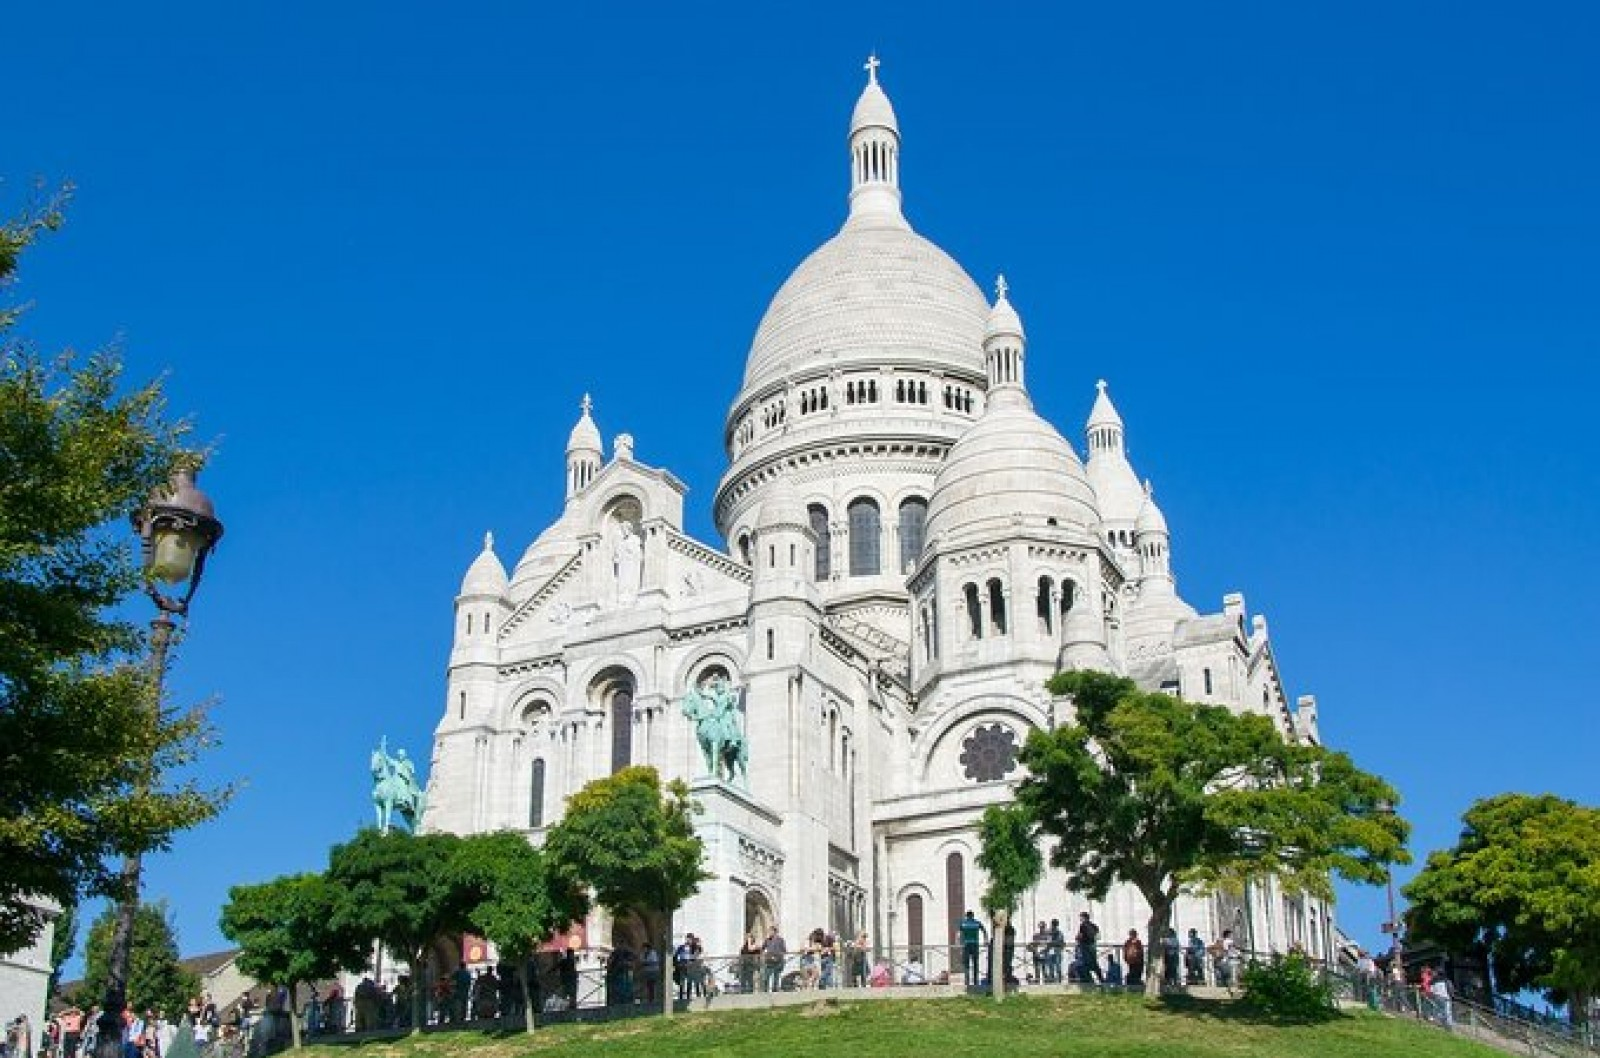 Podróż do Paryża